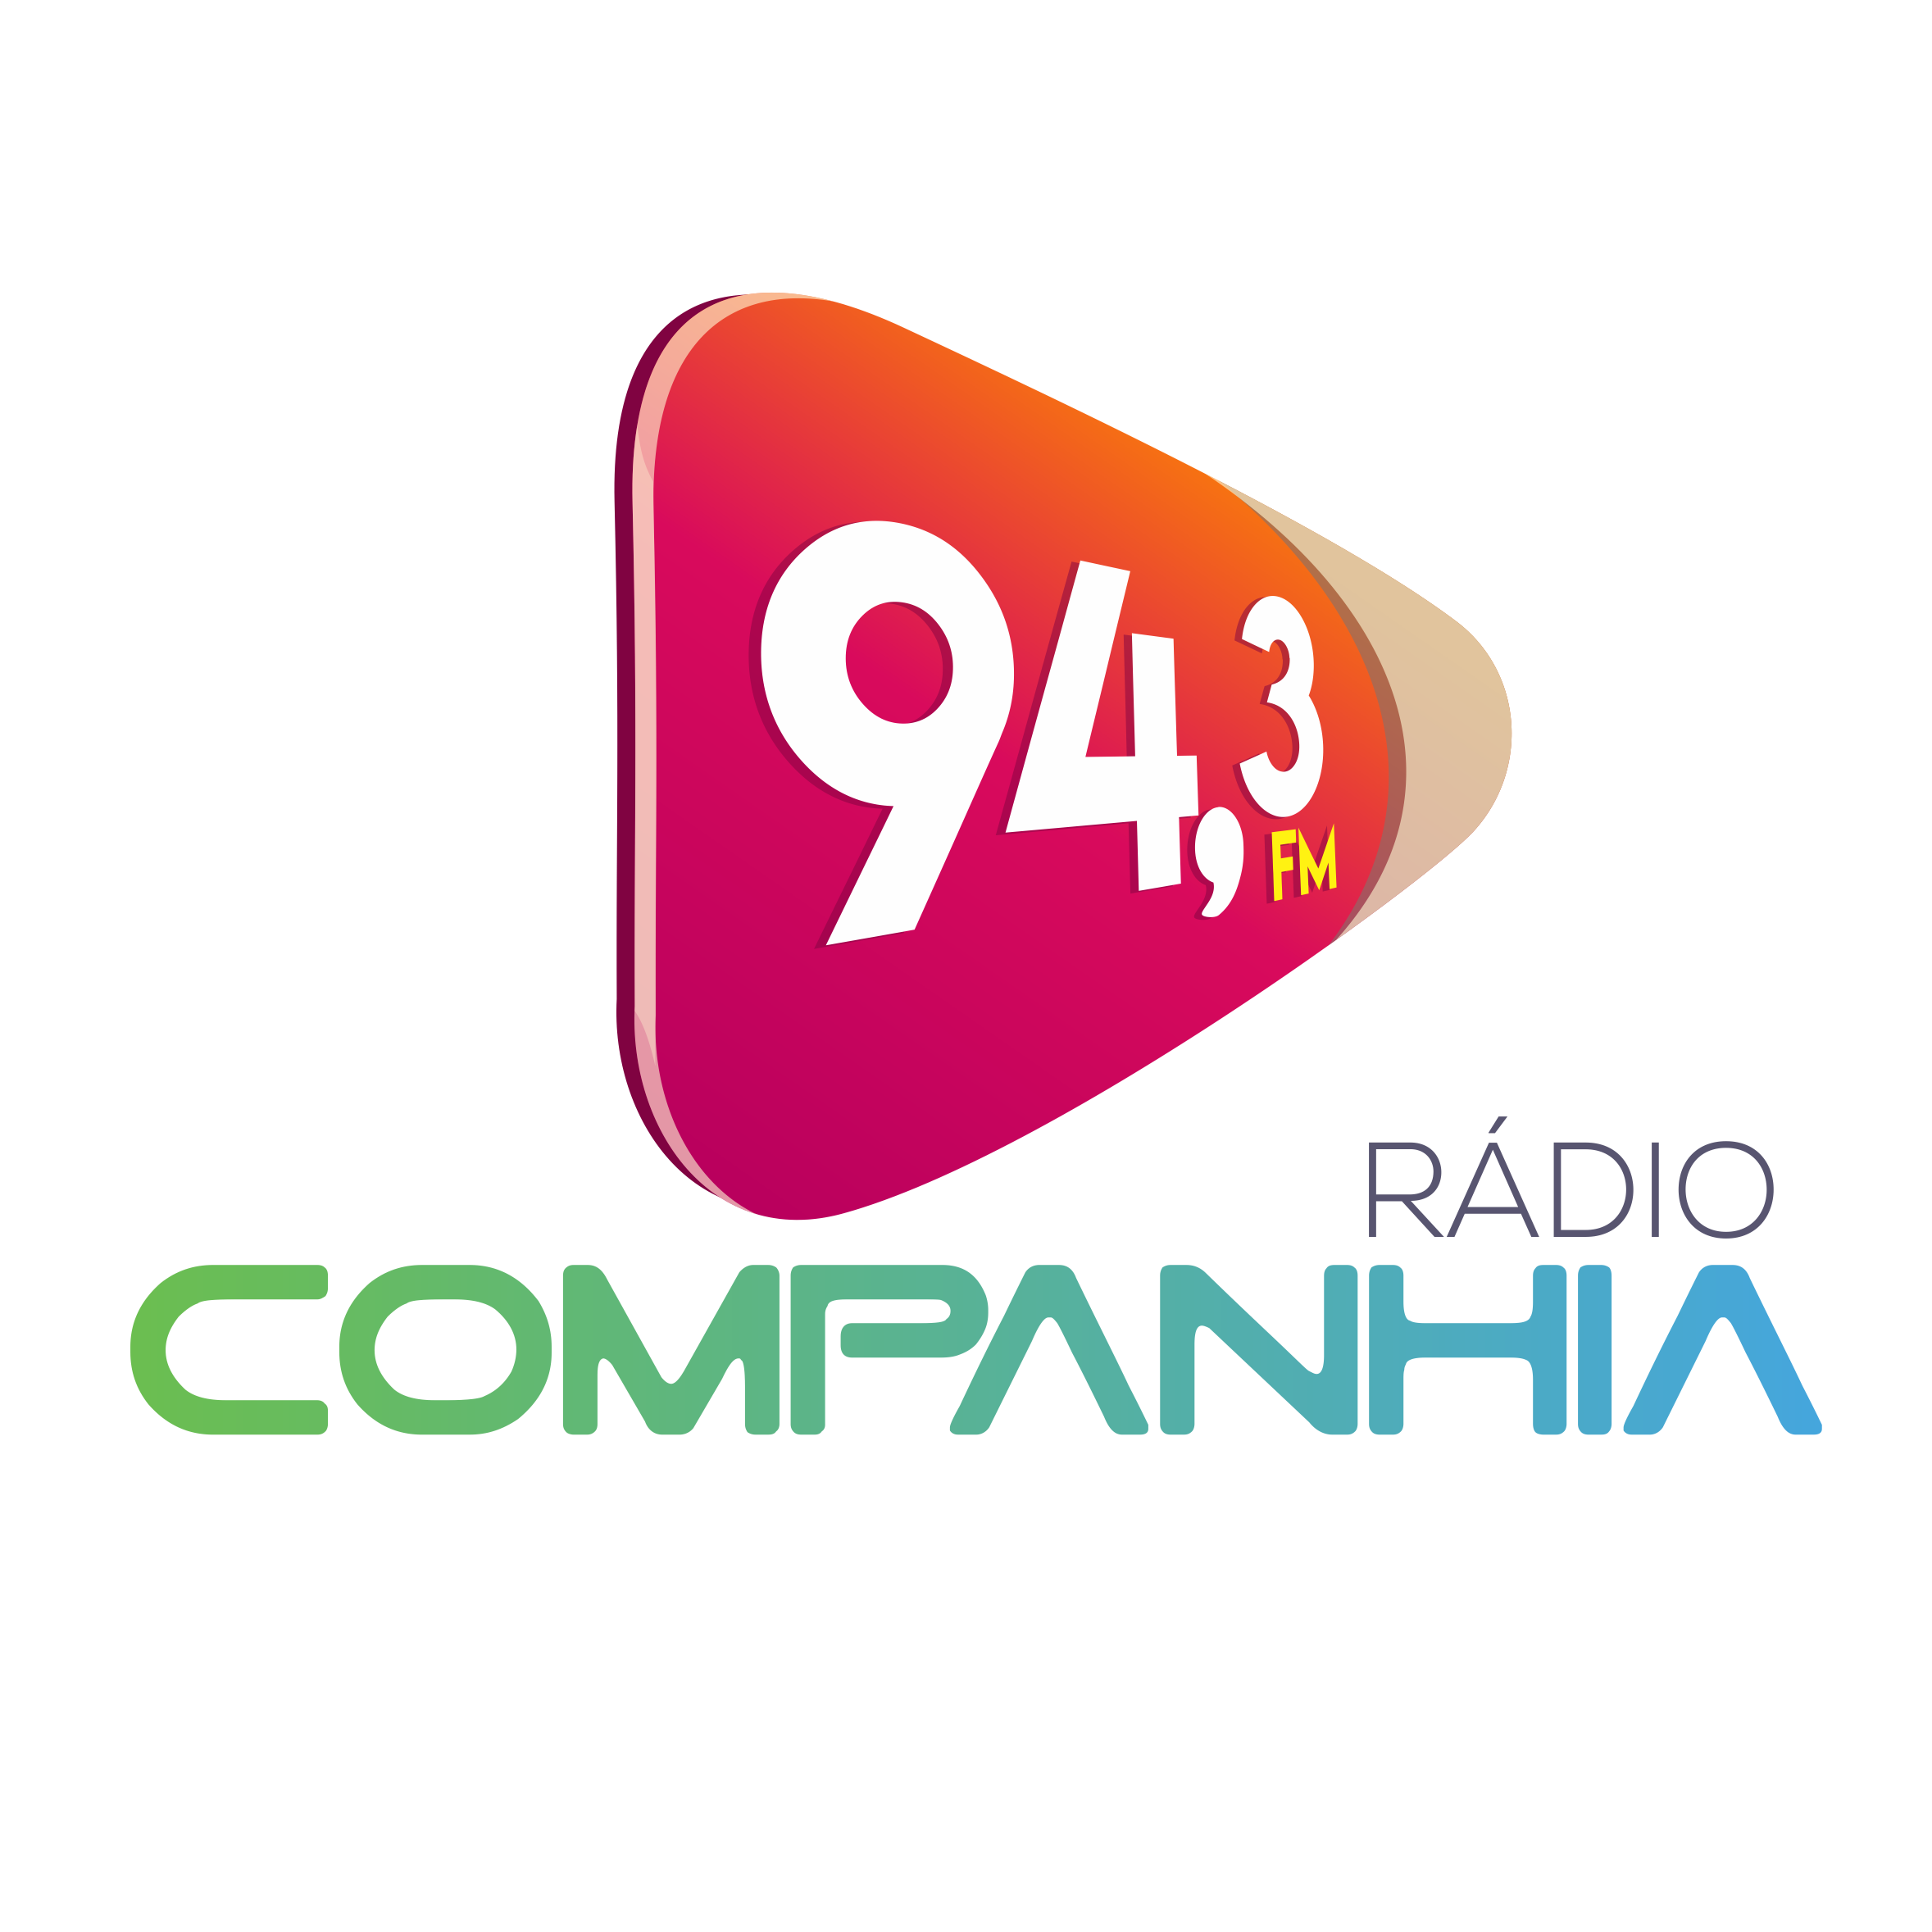 Companhia 94 FM